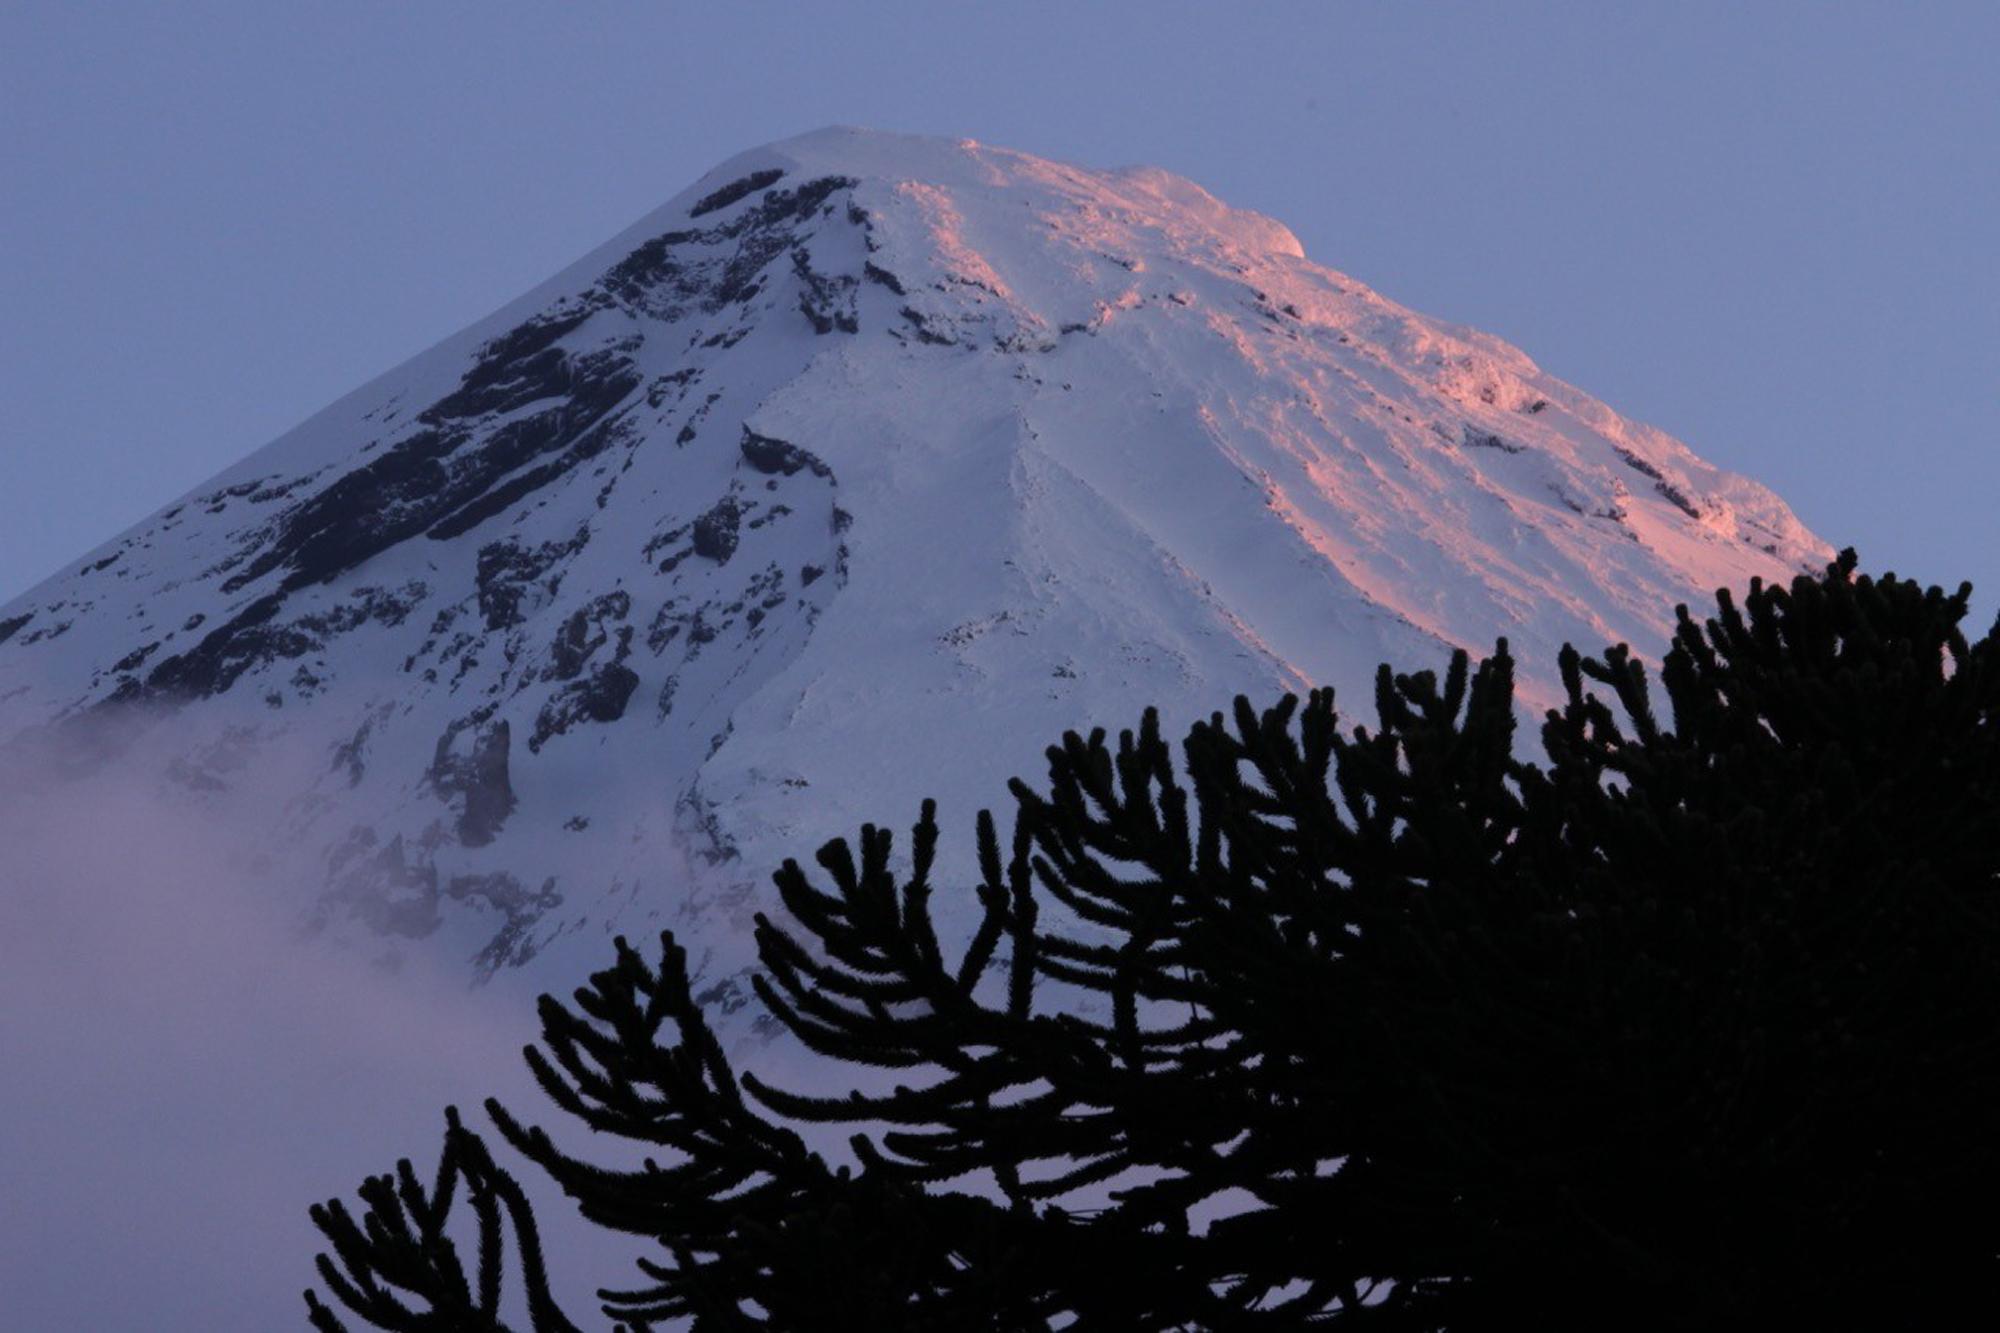 Canopy of an araucaria tree (Araucaria araucana) silhouetted against the sunset-coloured peak of Lanin Volcano.